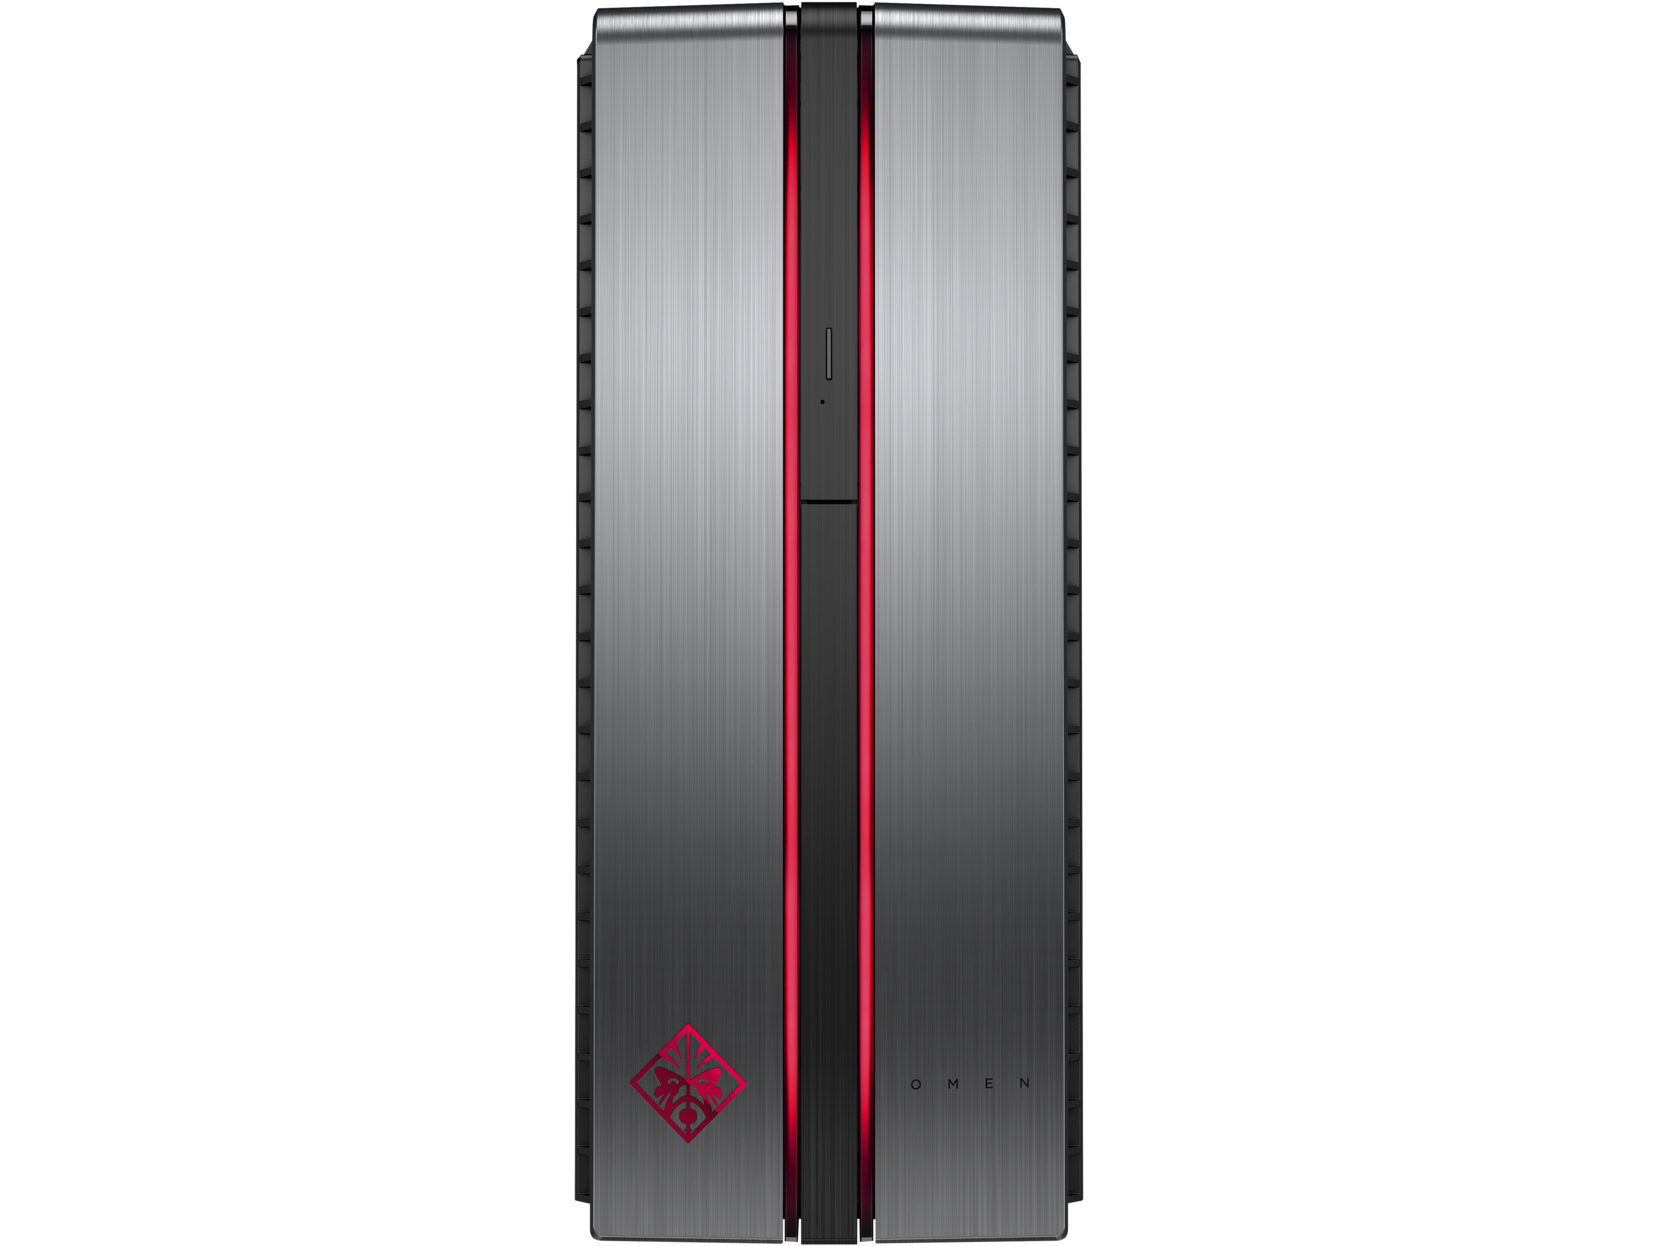 HP OMEN by Desktop PC 870-275na i7-7700 16Gb Ram 2Tb SATA 256GB SSD Win10 Home 64 1 year Warranty